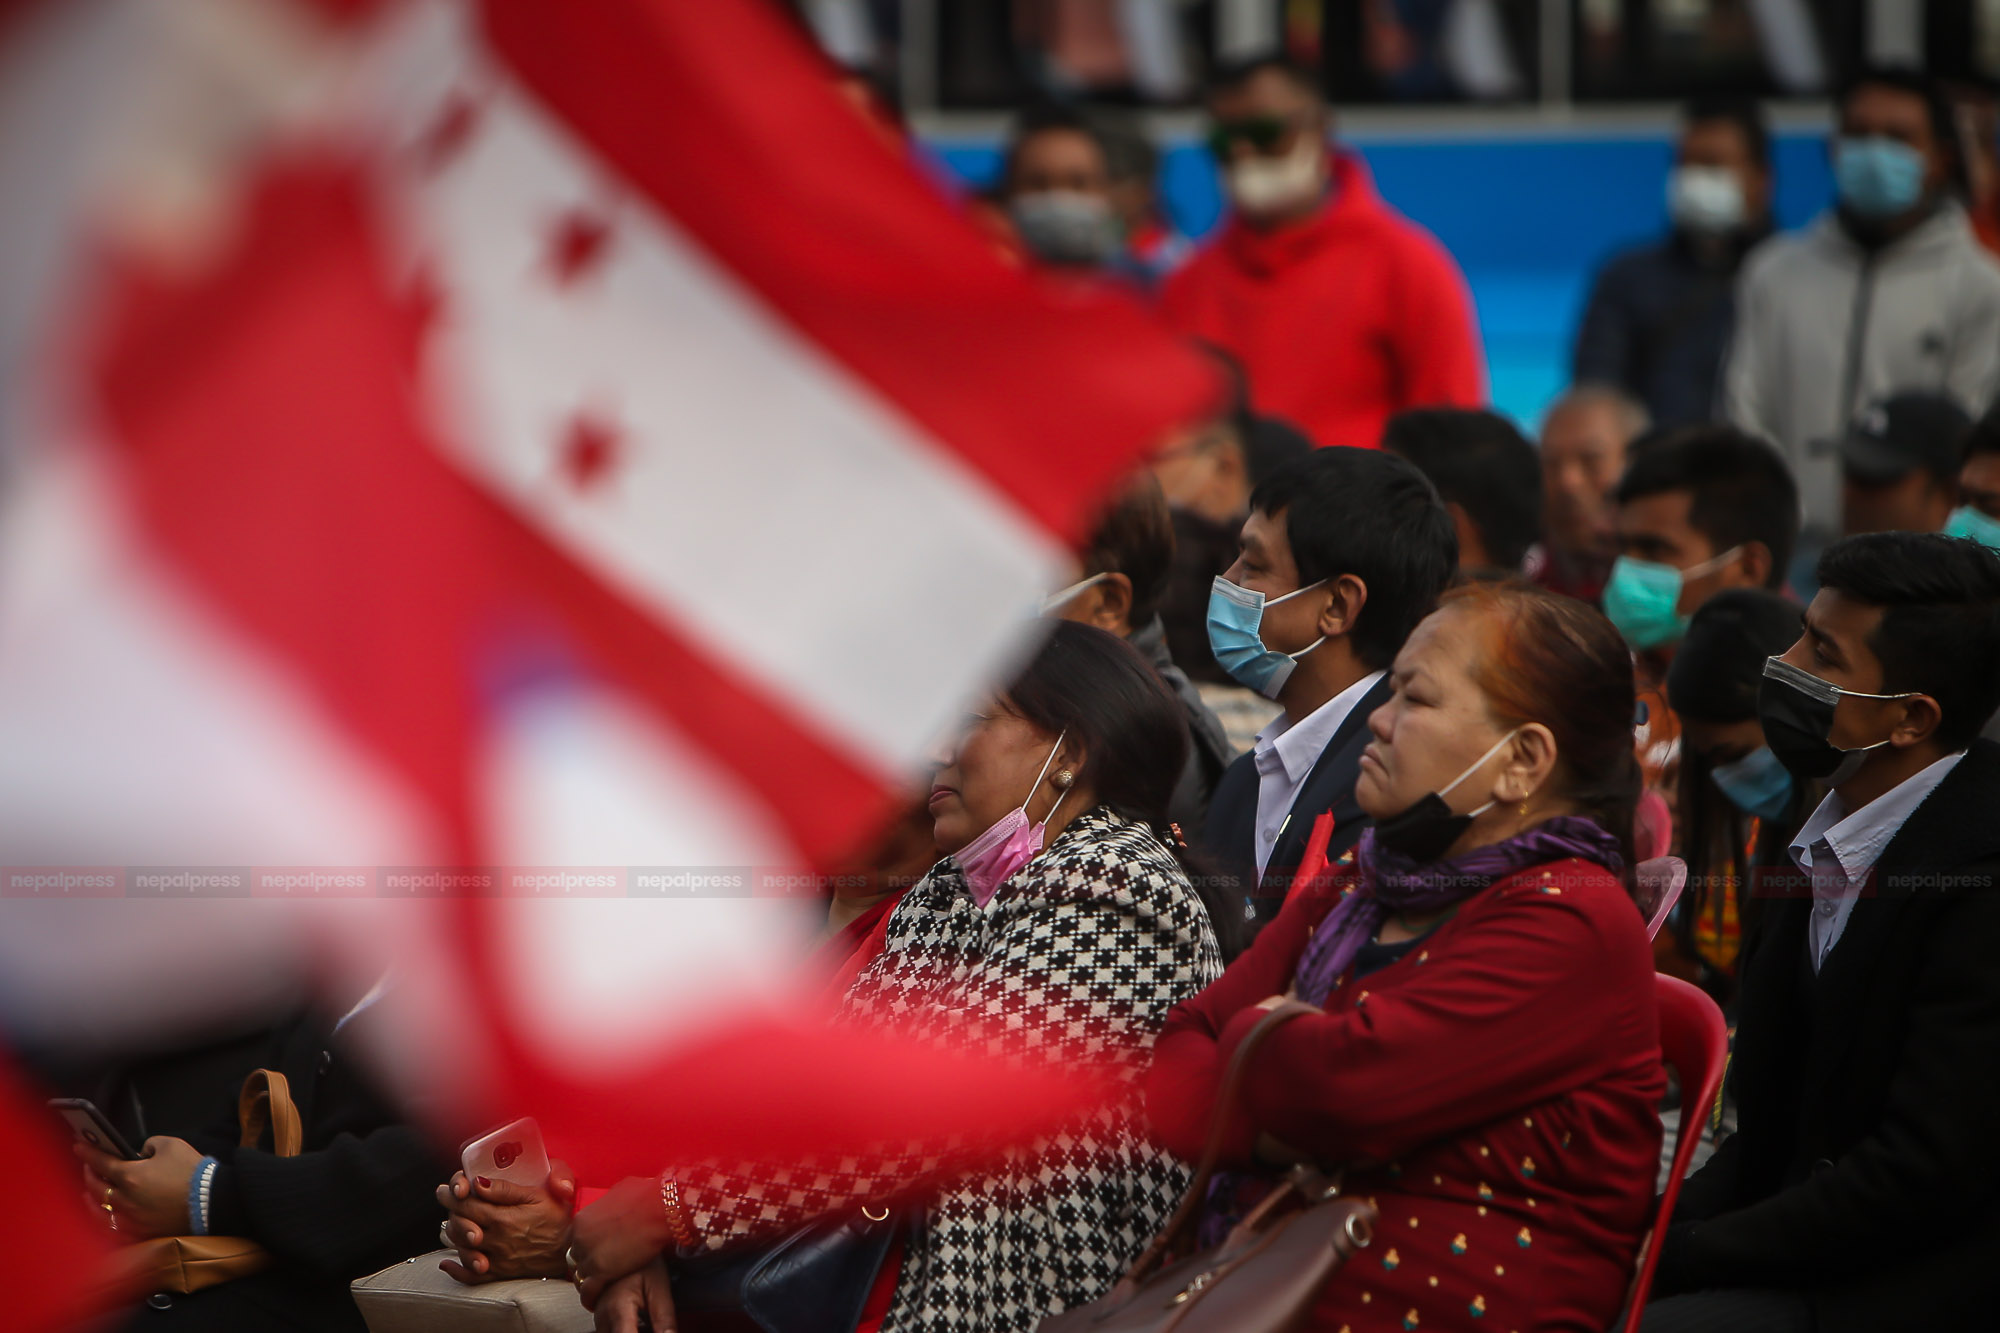 प्रतिनिधिसभा विघटनविरुद्ध कांग्रेसको प्रदर्शन